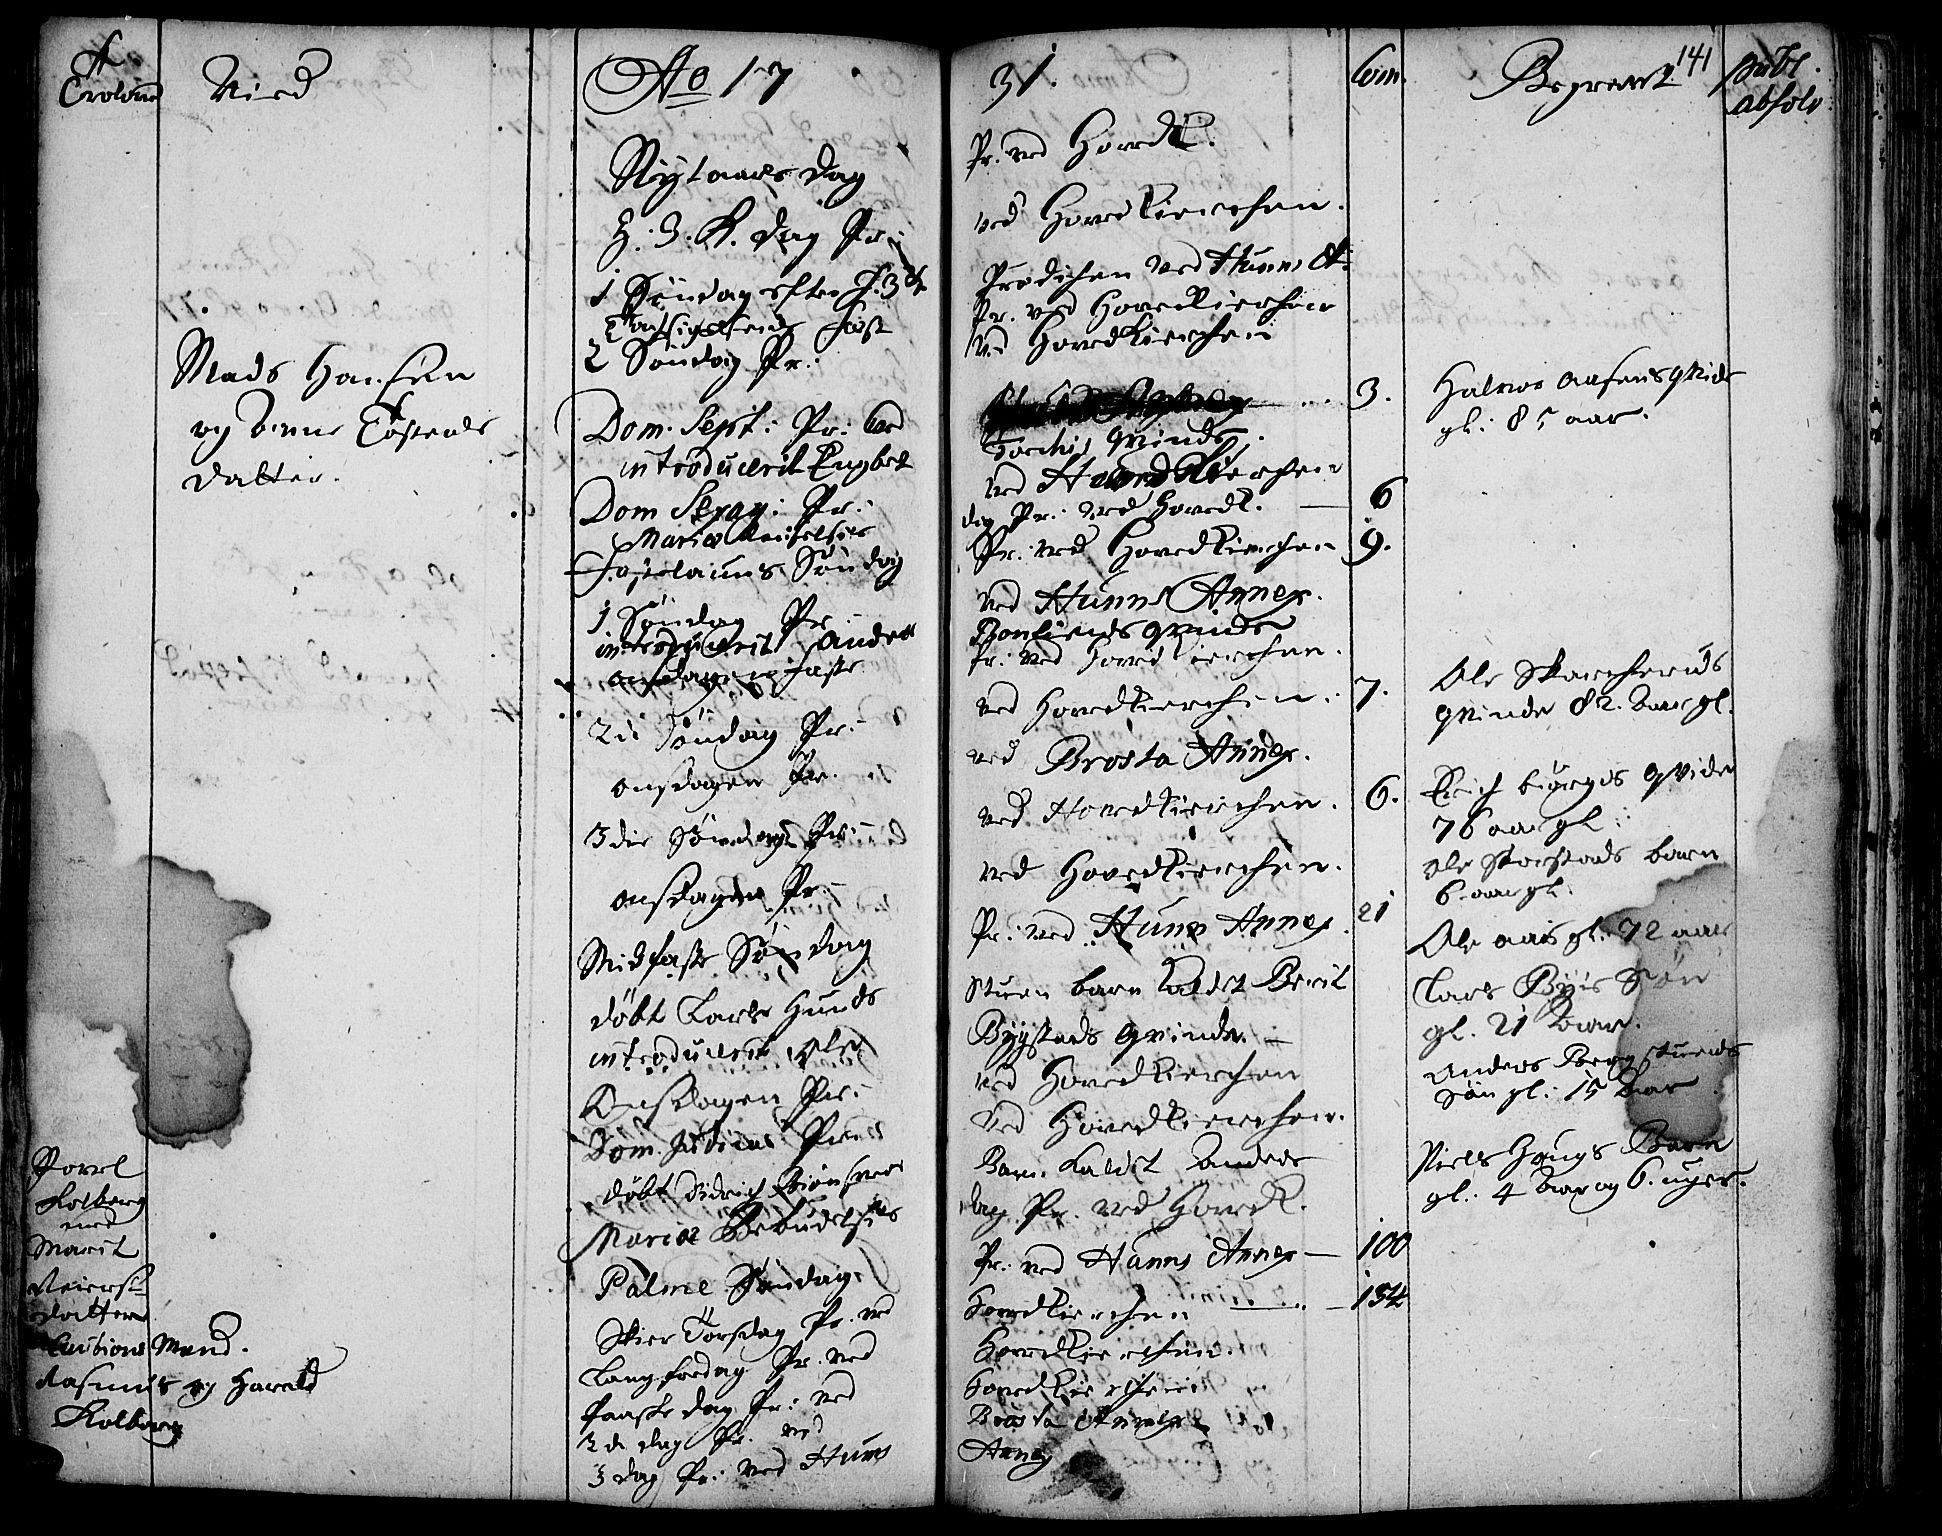 SAH, Vardal prestekontor, H/Ha/Haa/L0001: Ministerialbok nr. 1, 1706-1748, s. 141